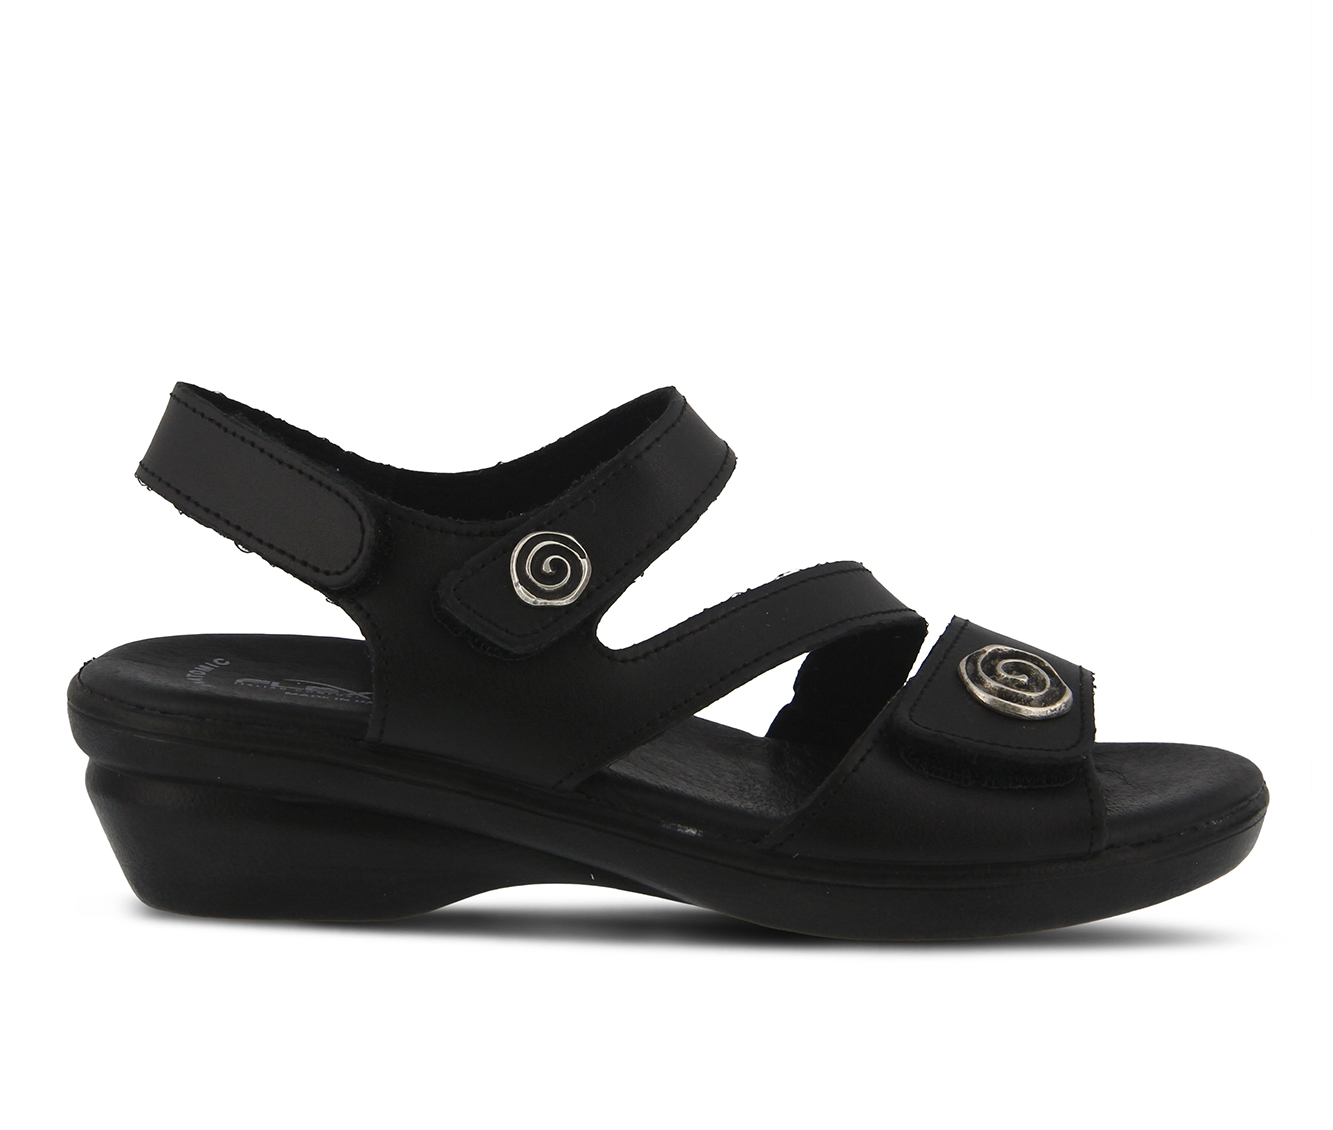 Flexus Safa Women's Sandal (Black Leather)